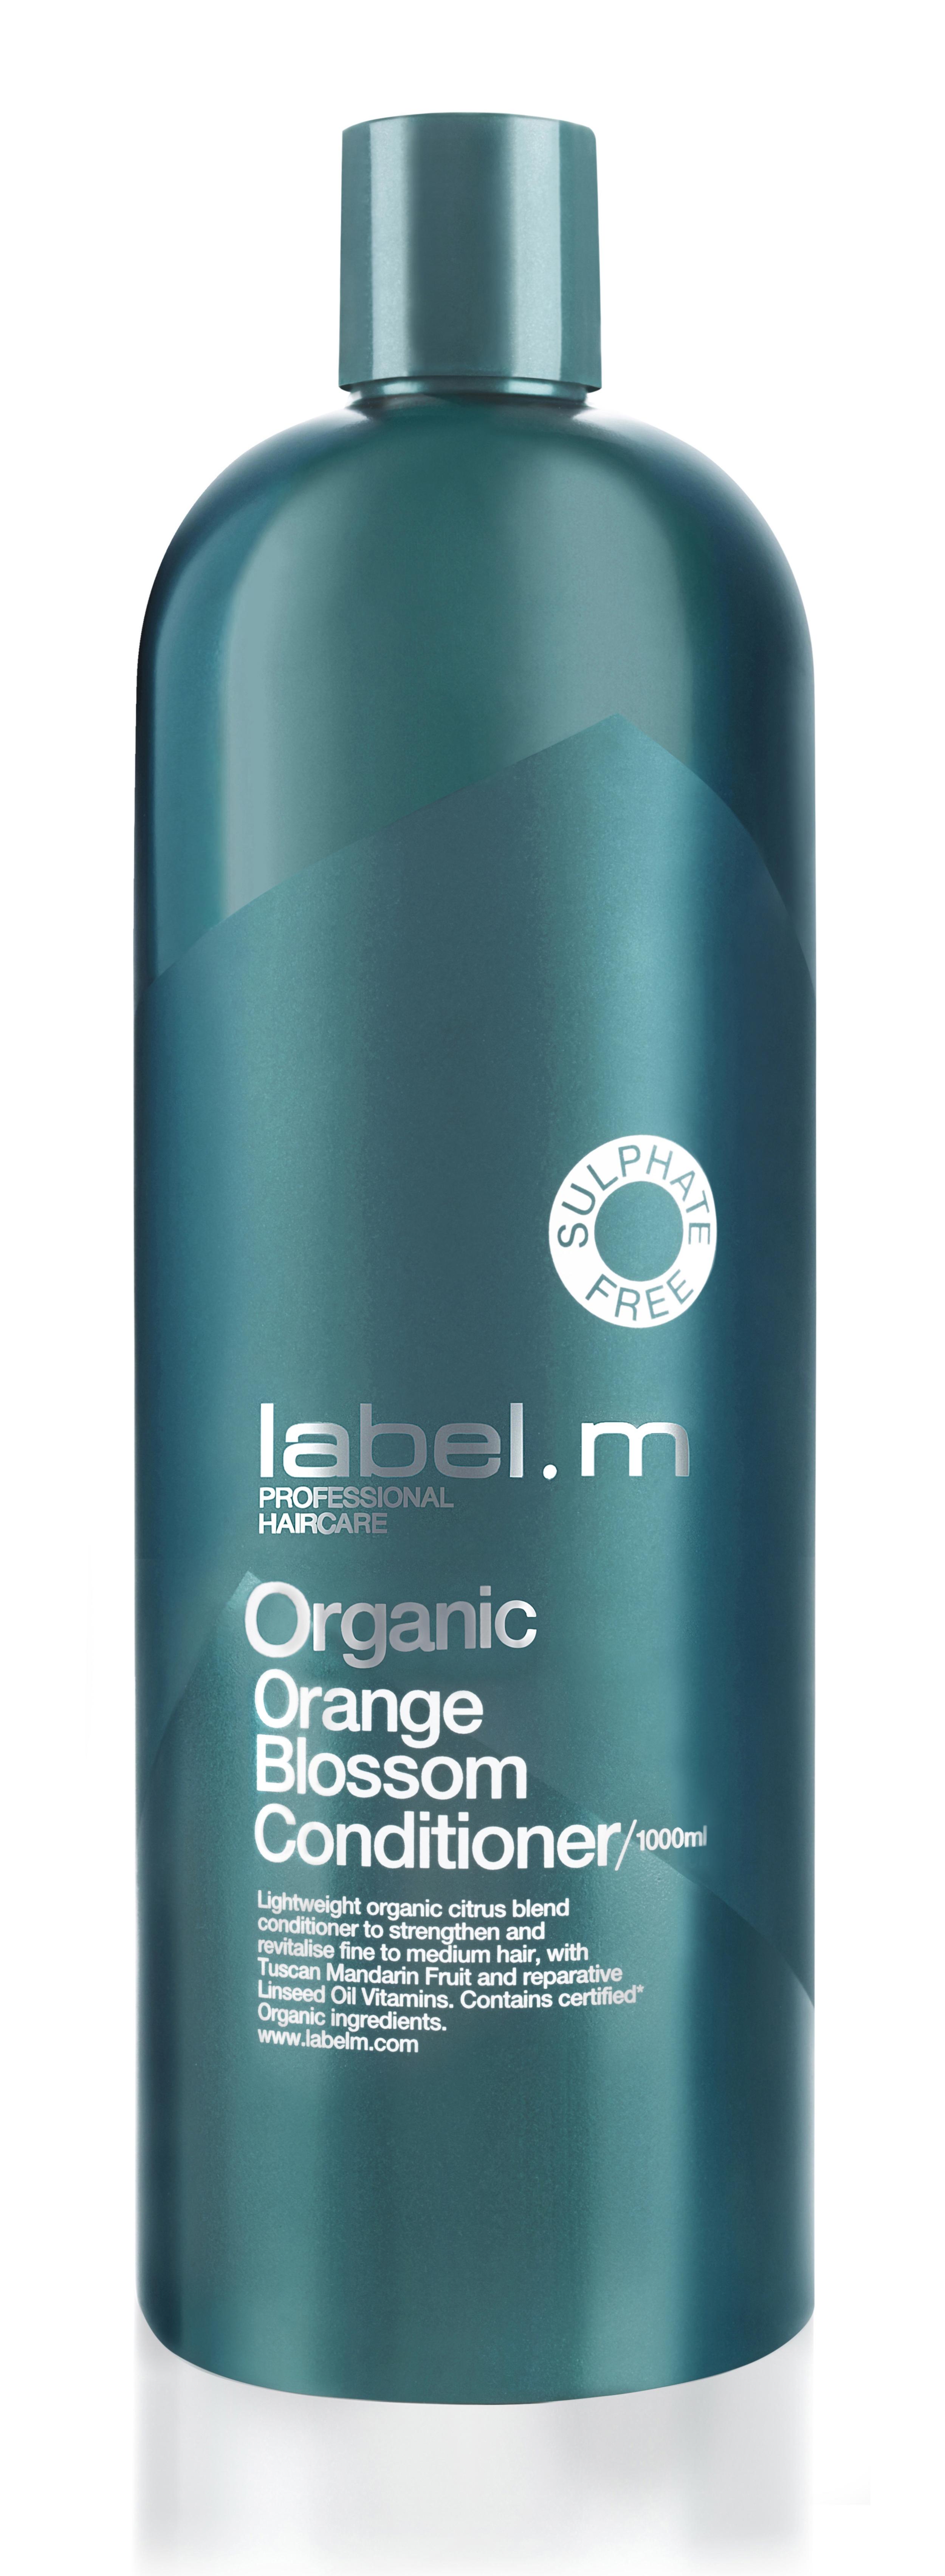 Organic Orange Blossom Conditioner 1000ml